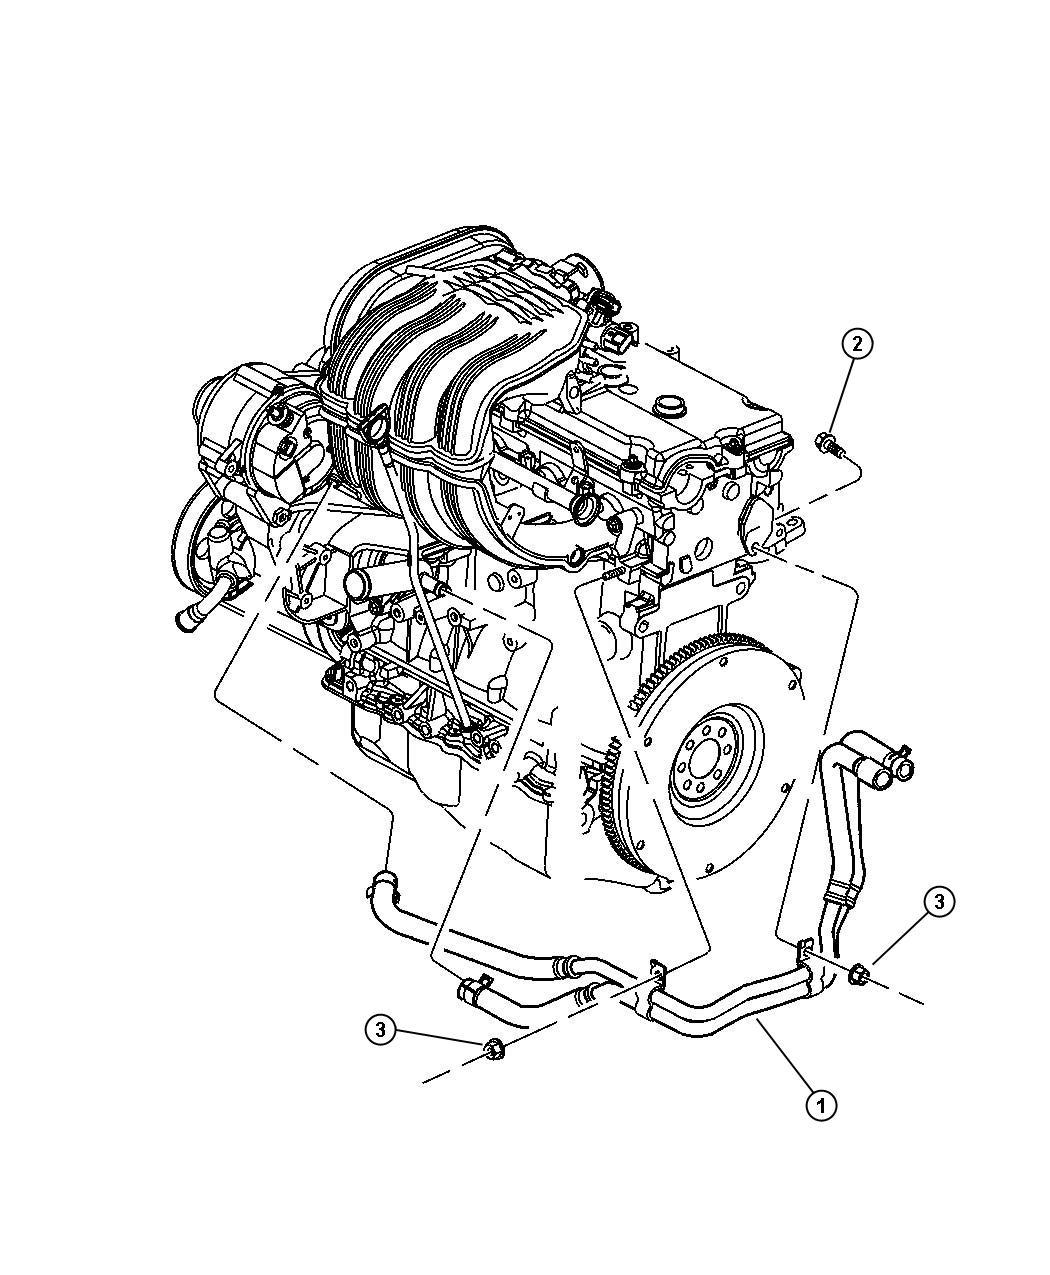 Jeep Liberty Plumbing Heater 2 4l Engine Lhd